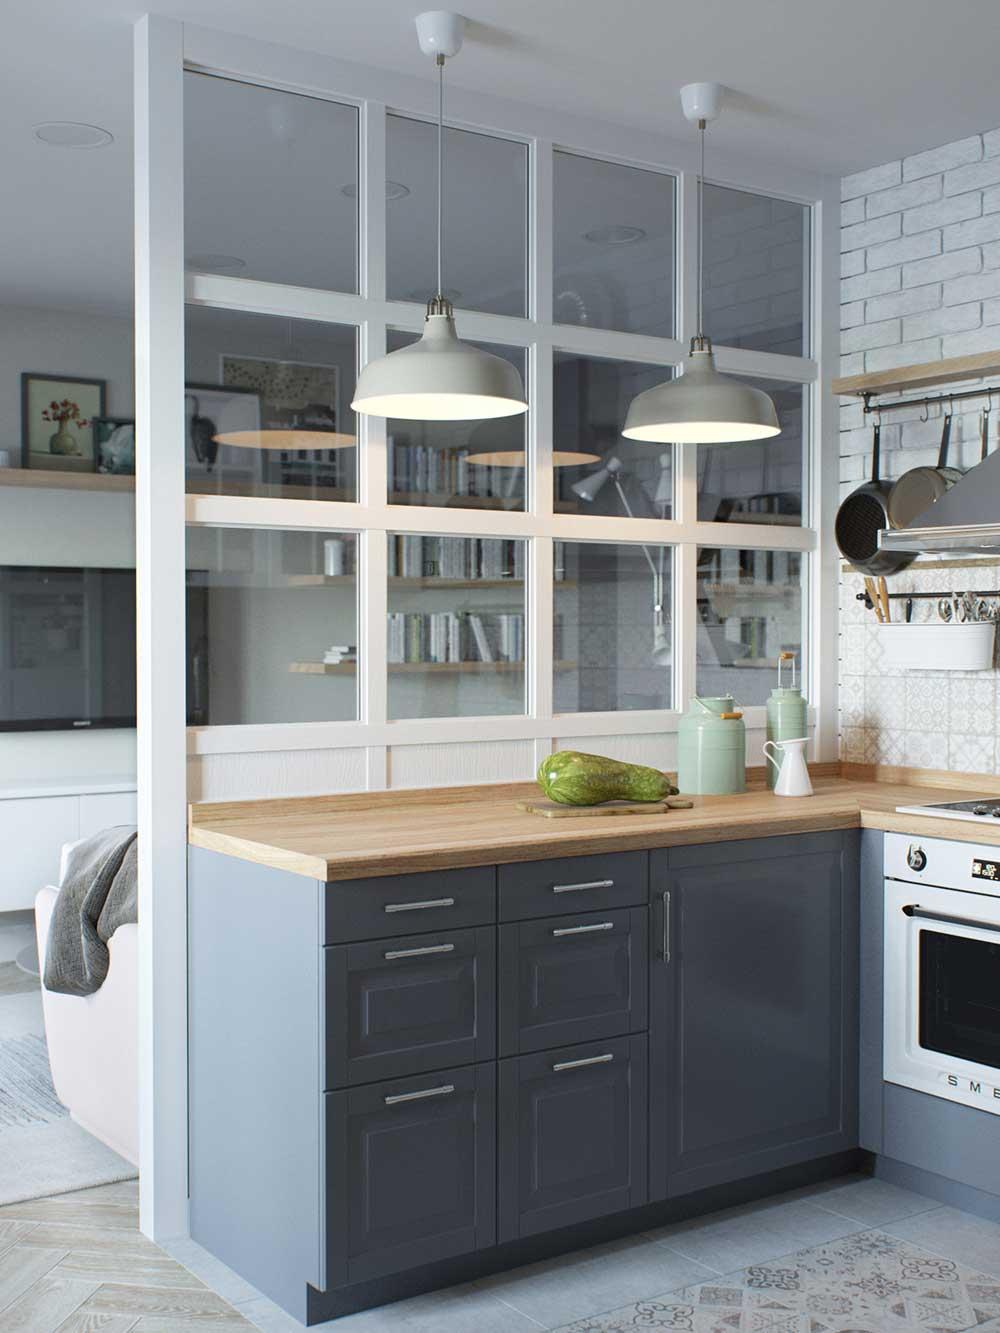 tiny apartment kitchen design jl - Amur Tiny Apartment Design